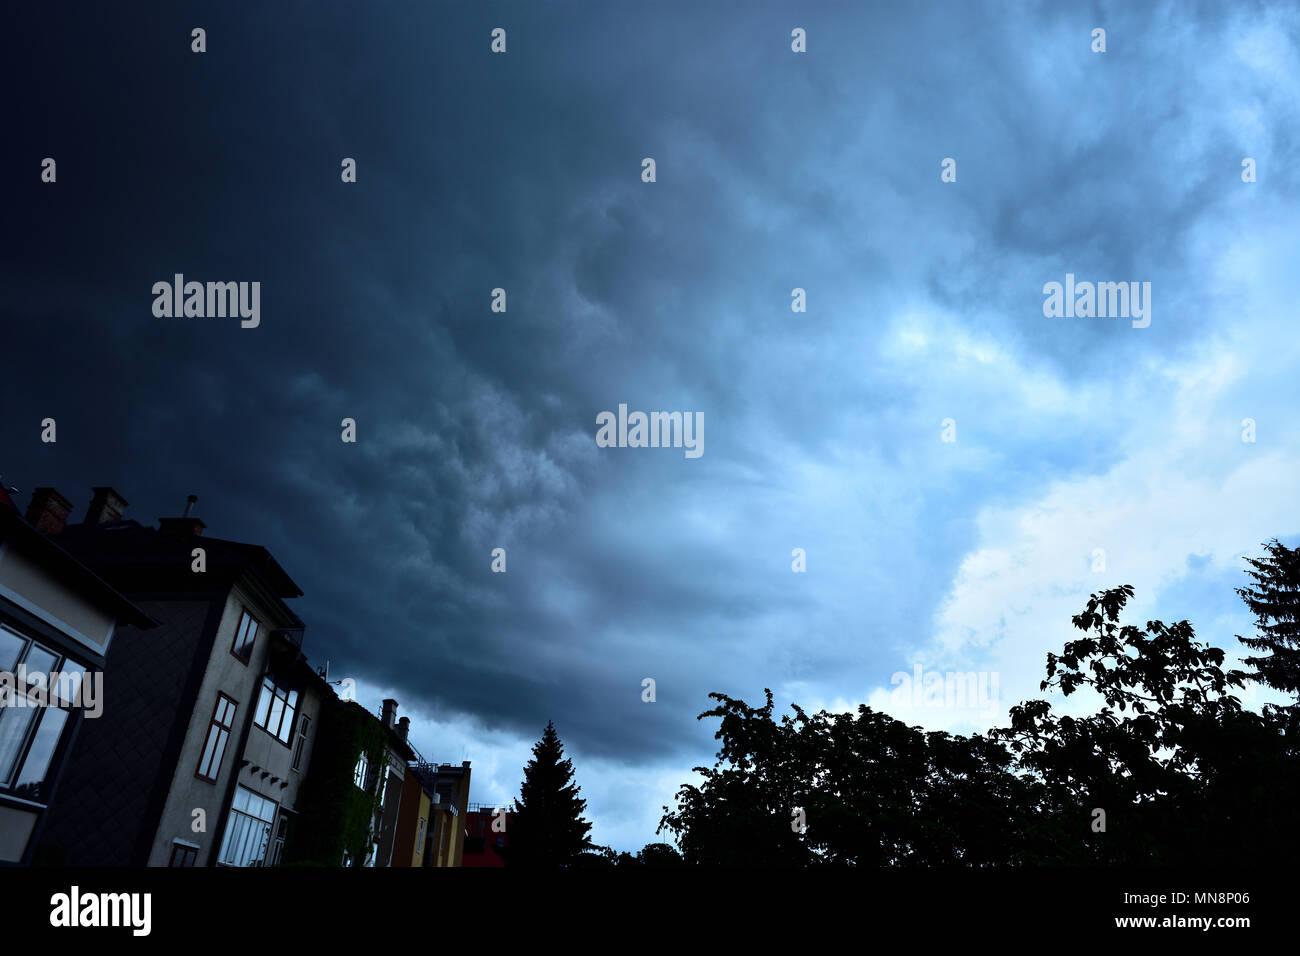 Huge dark cumulonimbus thundercloud time-lapse over the outskirts of Vienna, Austria. Thunderstorm darkens the evening sky. - Stock Image